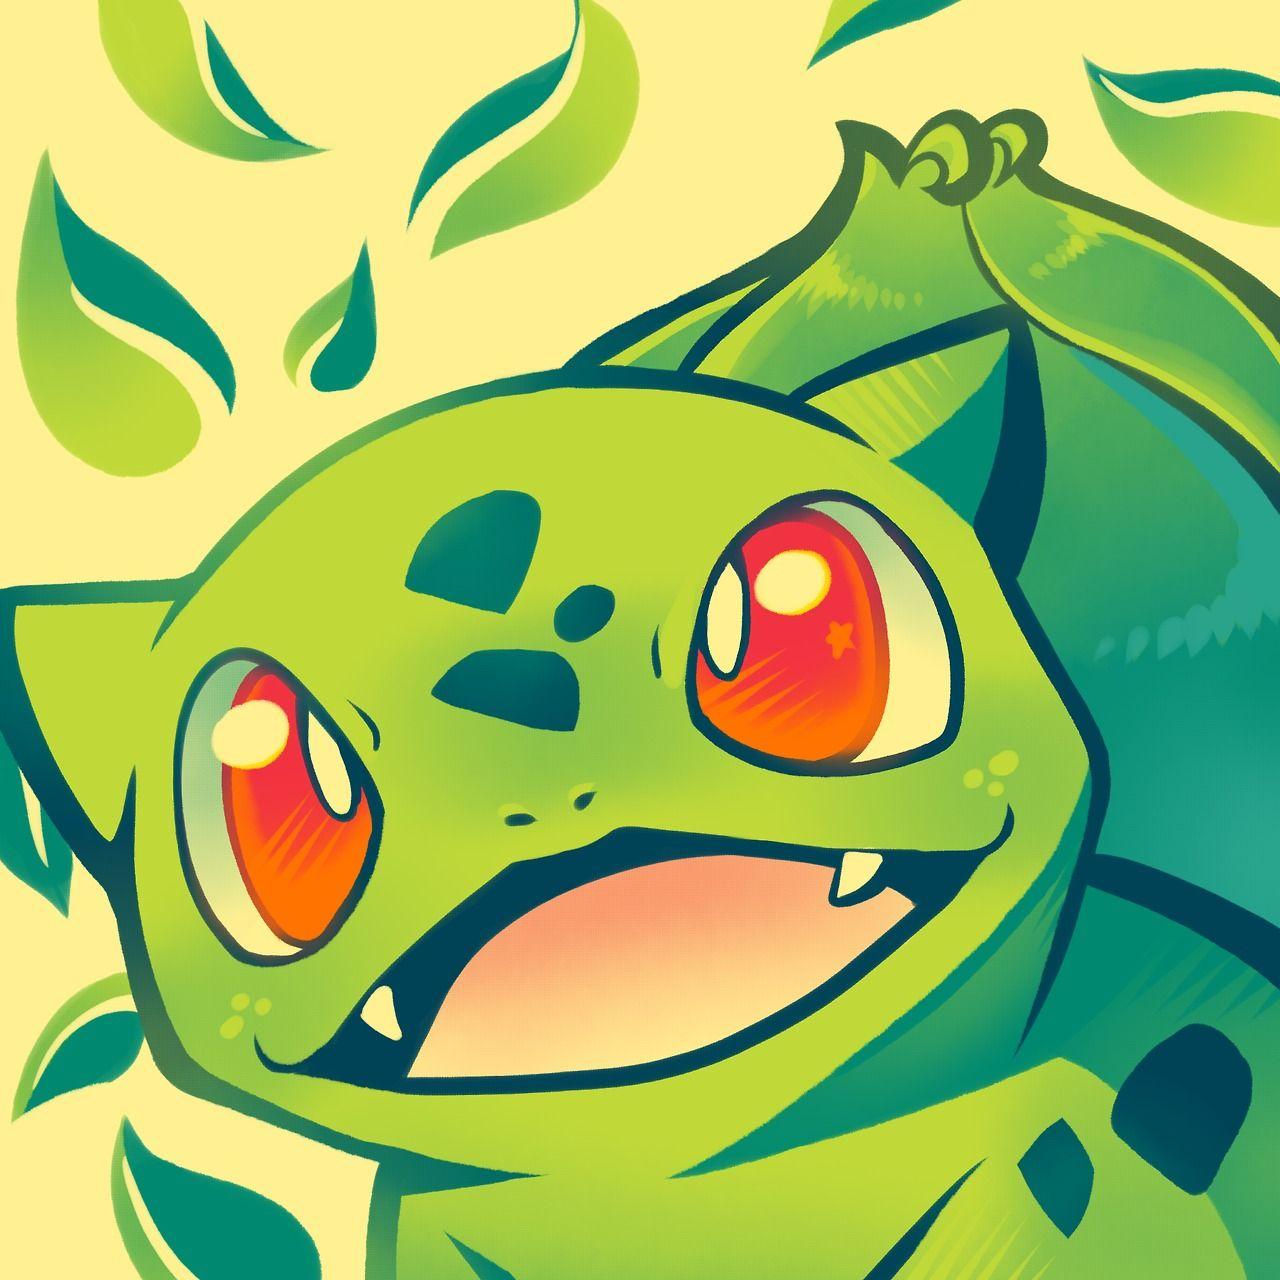 Most Adorable Bulbasaur Pokemon Pinterest Pokémon Bulbasaur